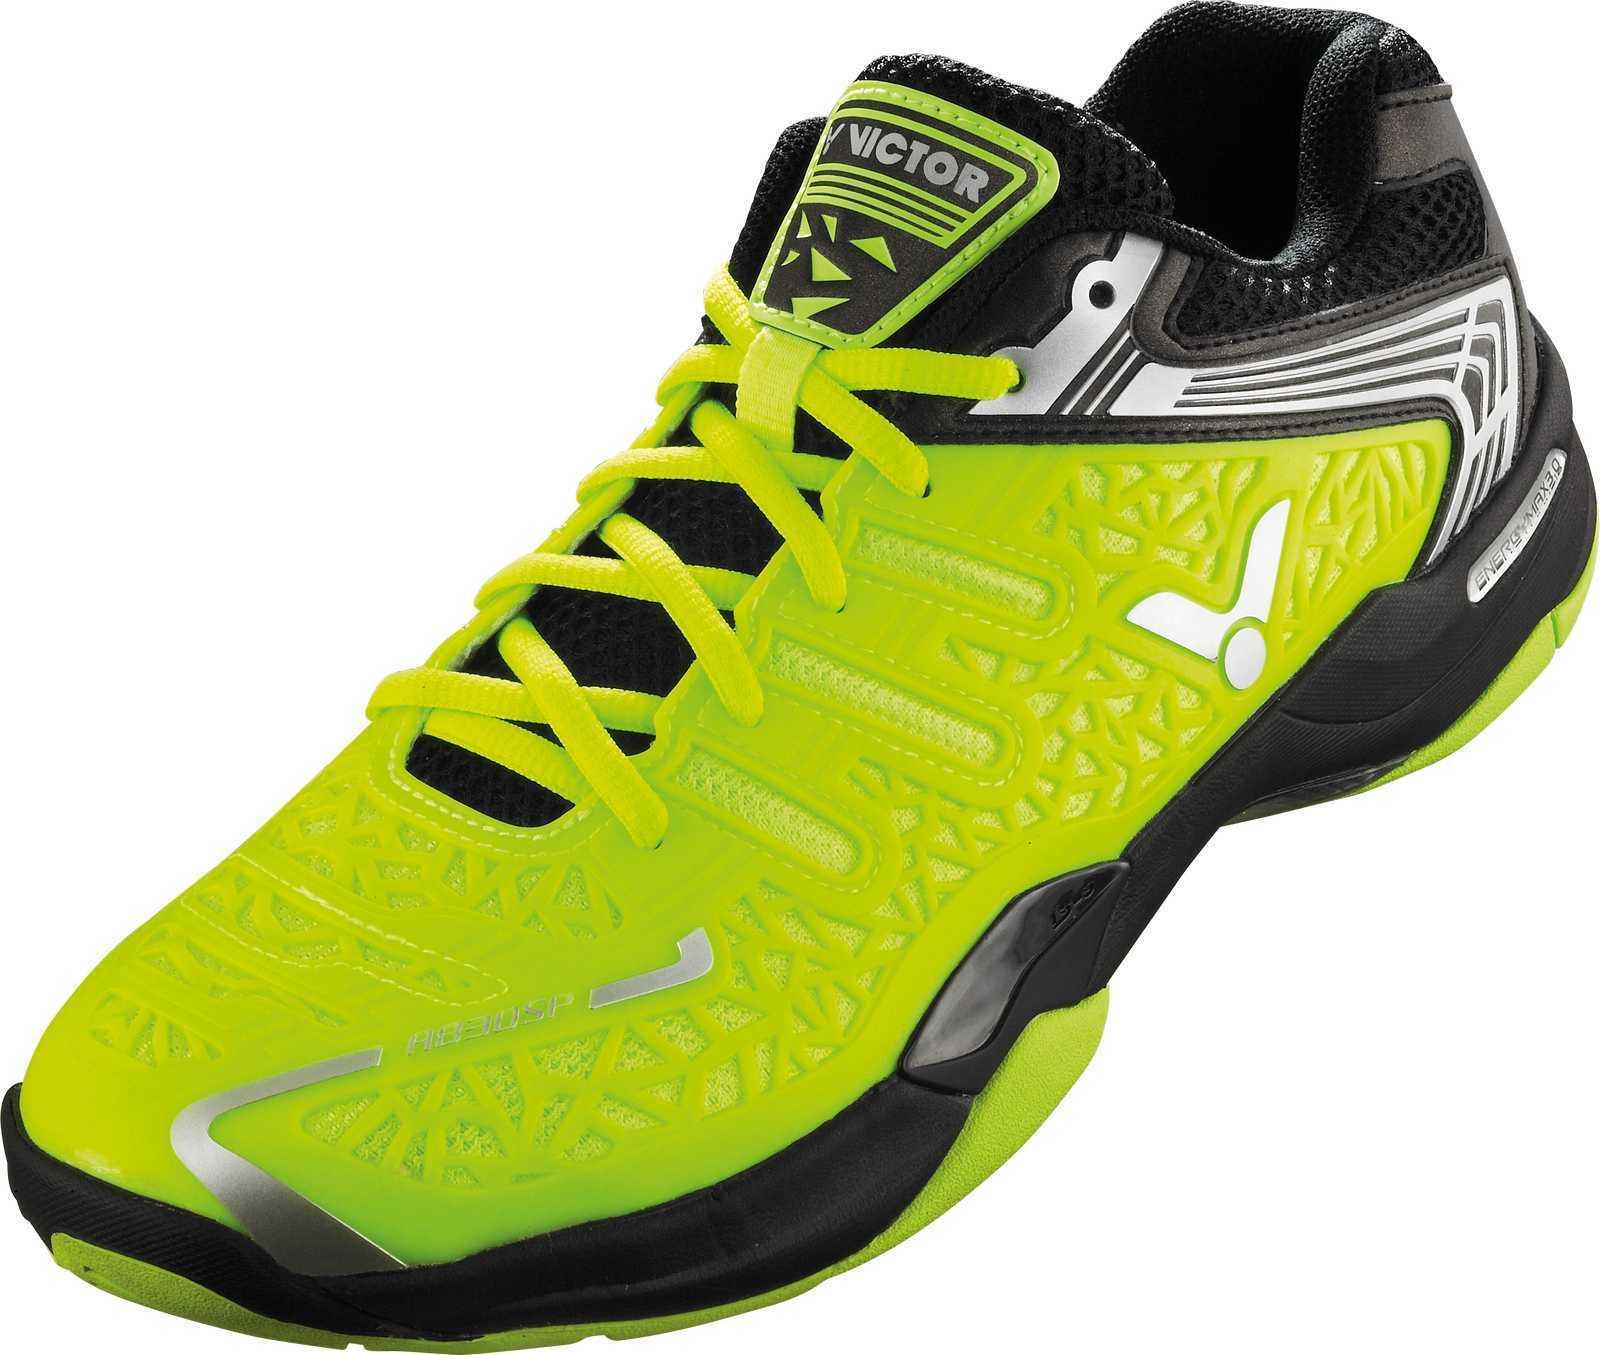 Victor Schuh SH-A830SP    Schuh Schuh Schuh Badminton Tischtennis Squash 09c3e7